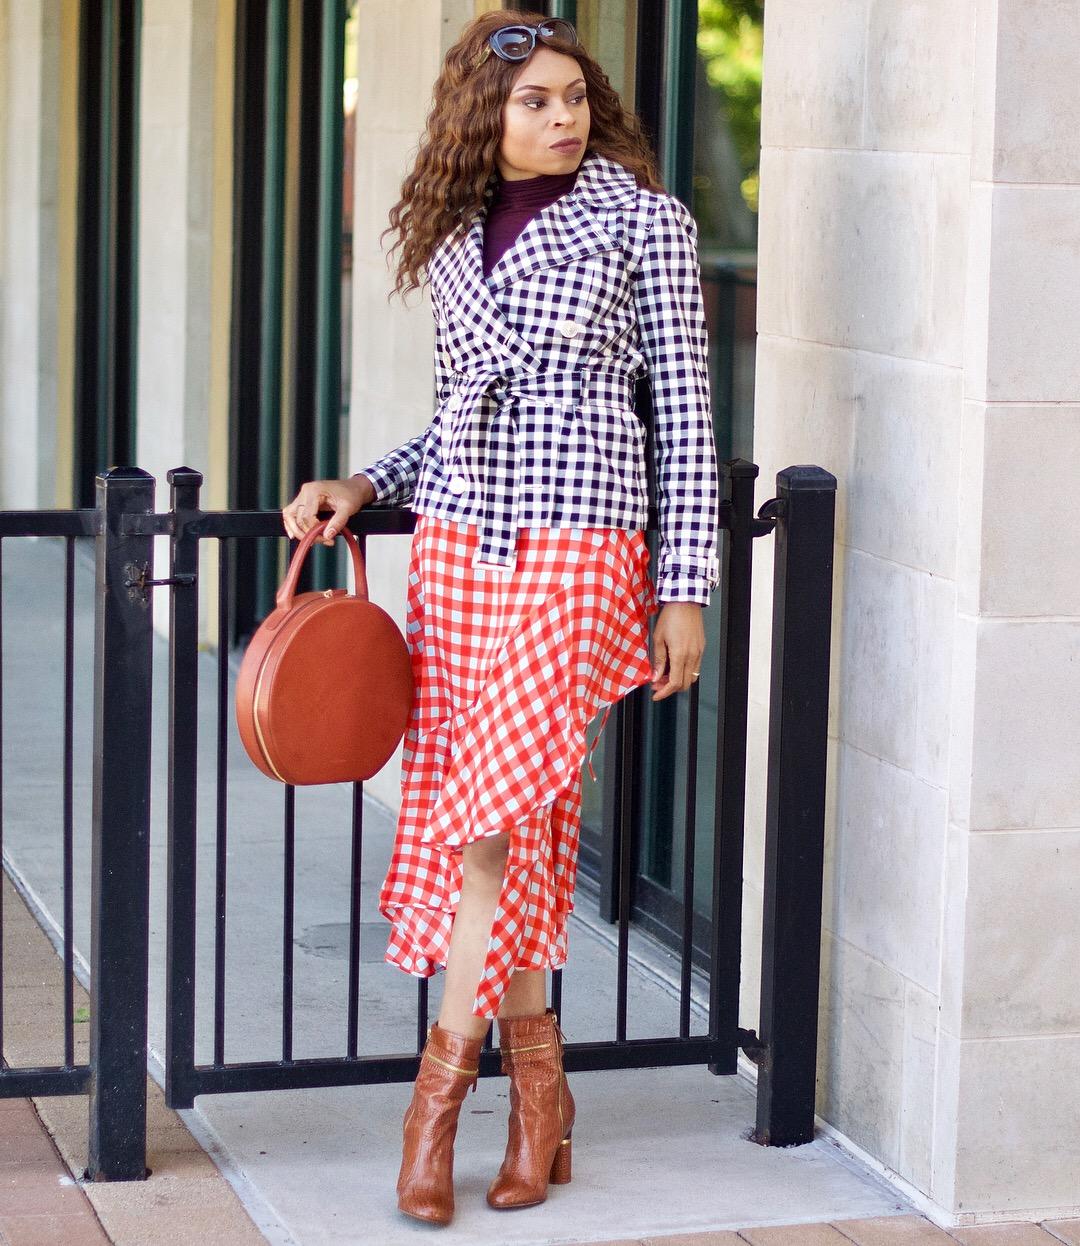 DVF Asymmetric sleeveless wrap dress-Fall transition